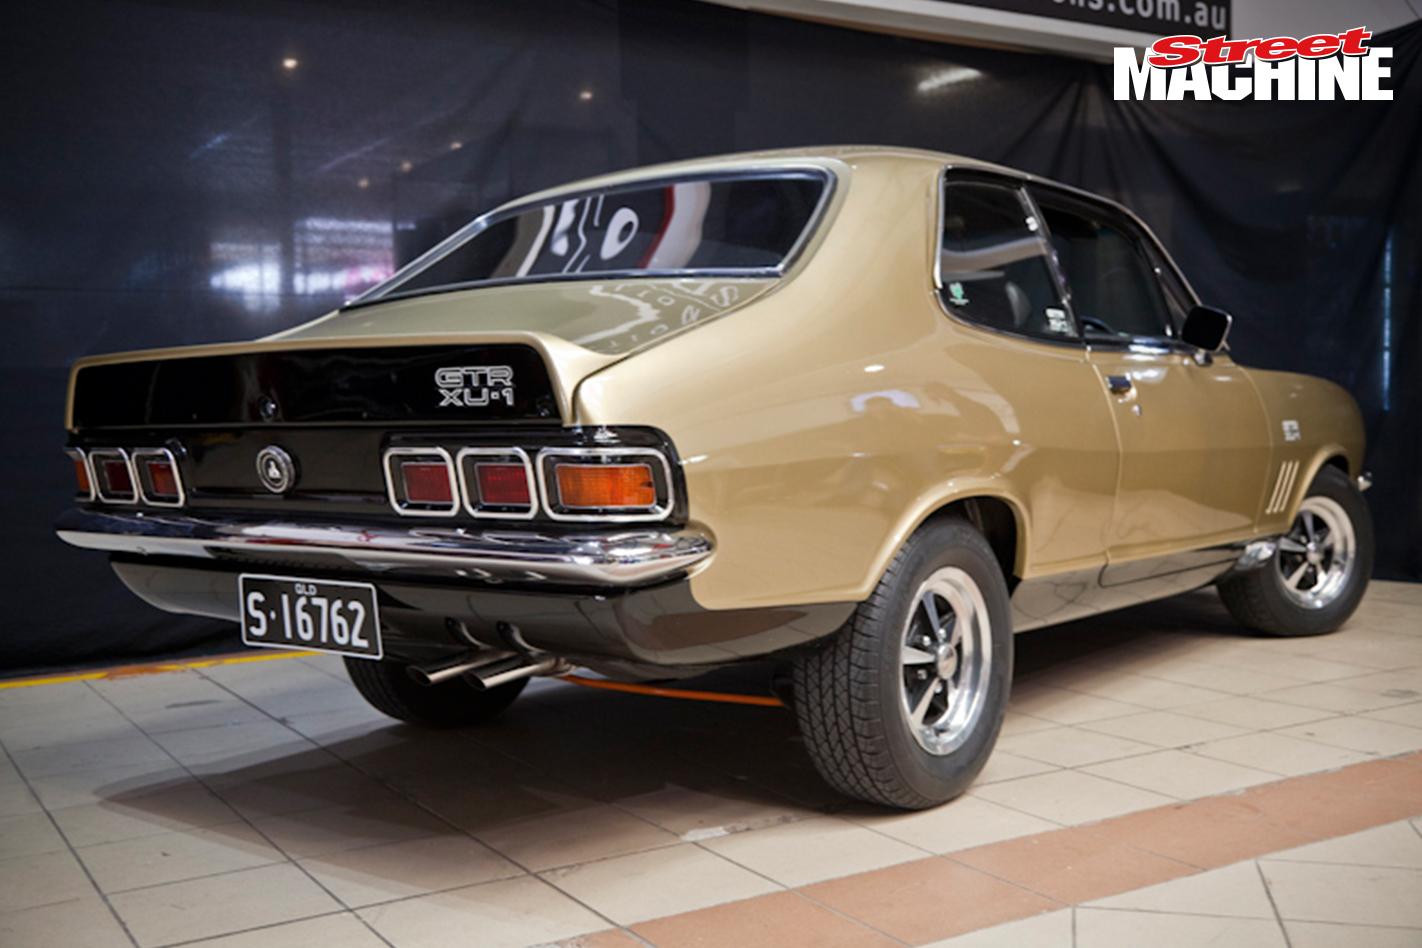 Holden Torana XU1 GTR